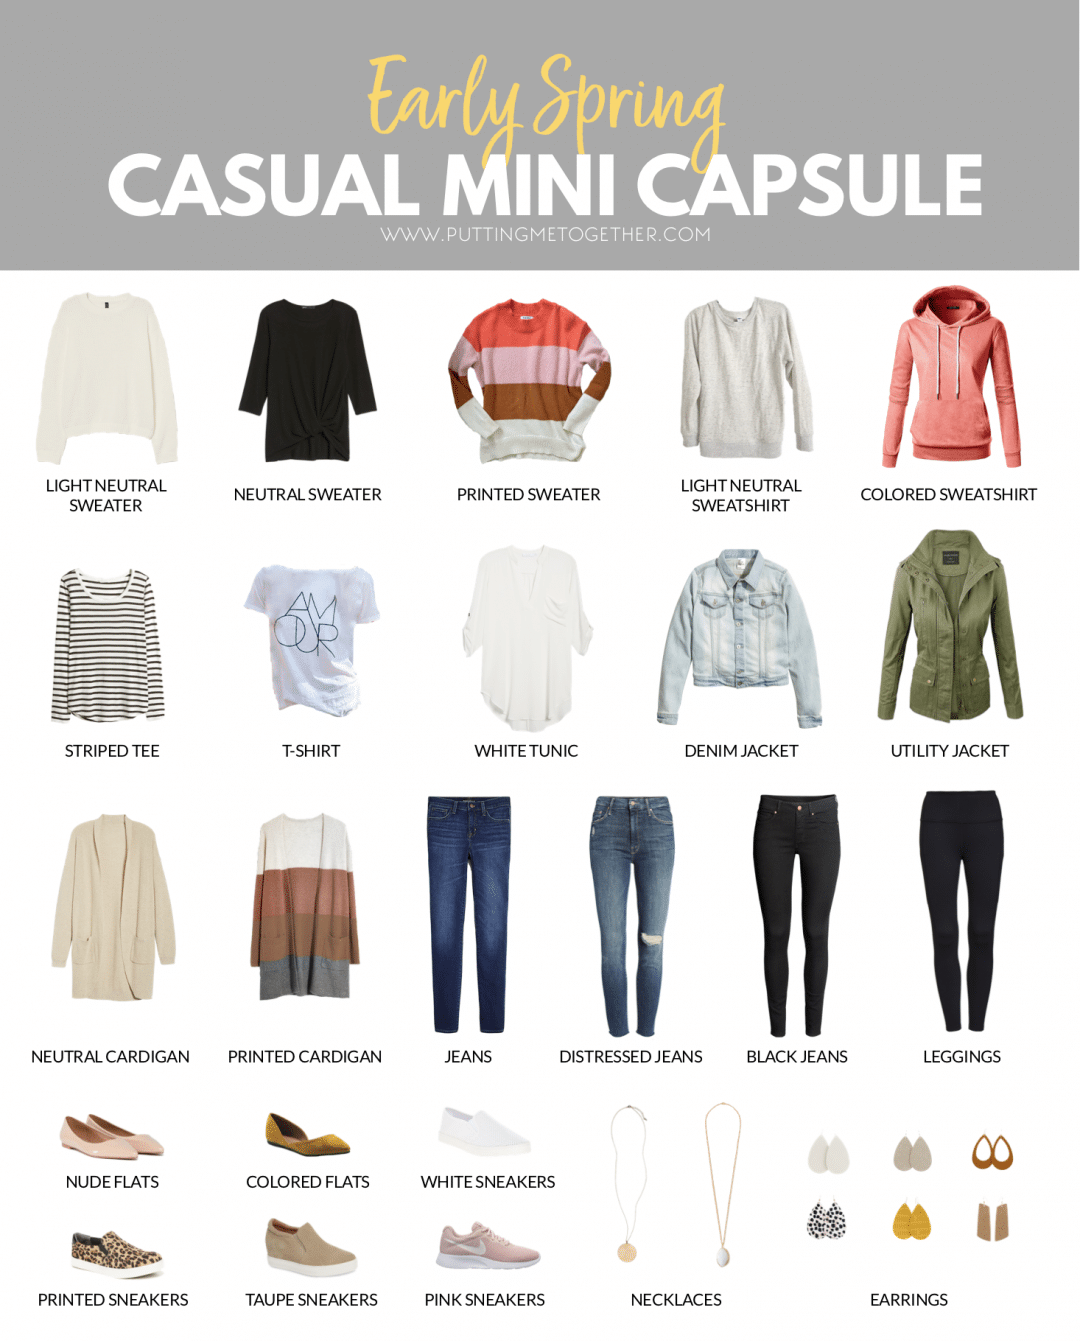 Mini Early Spring Casual Capsule Wardrobe